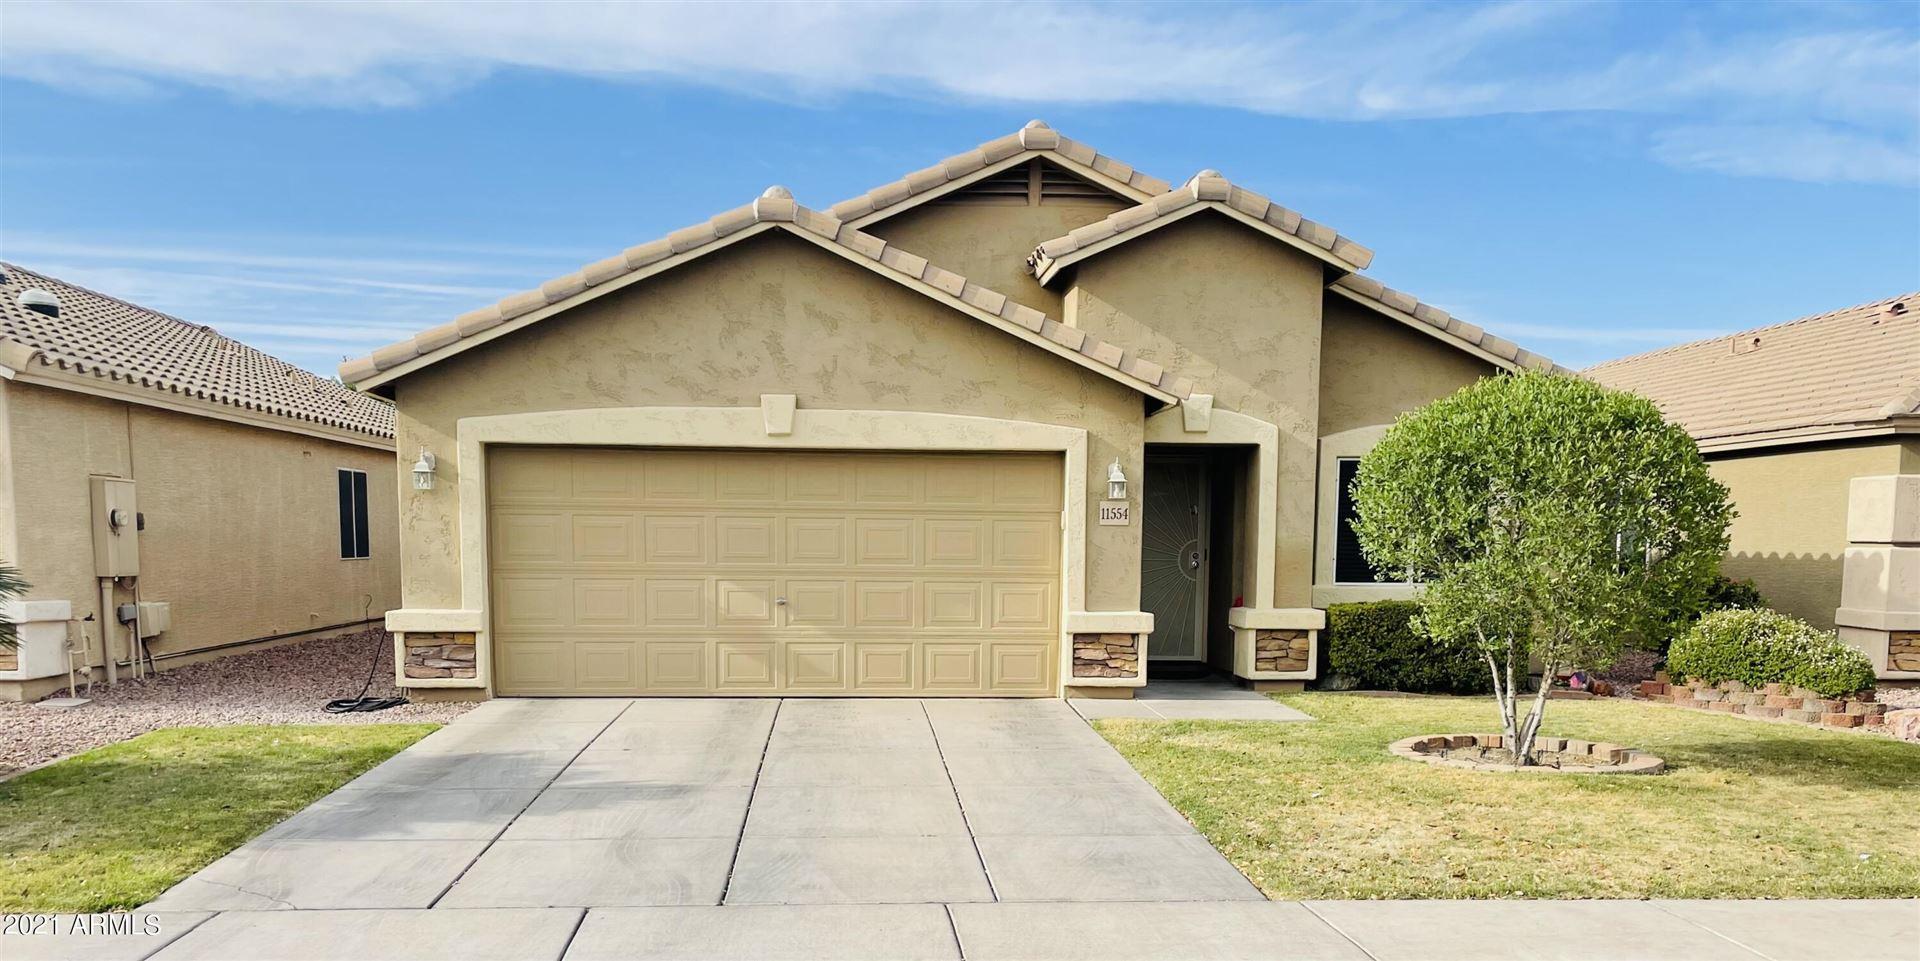 Photo of 11554 W CAROL Avenue, Youngtown, AZ 85363 (MLS # 6225770)